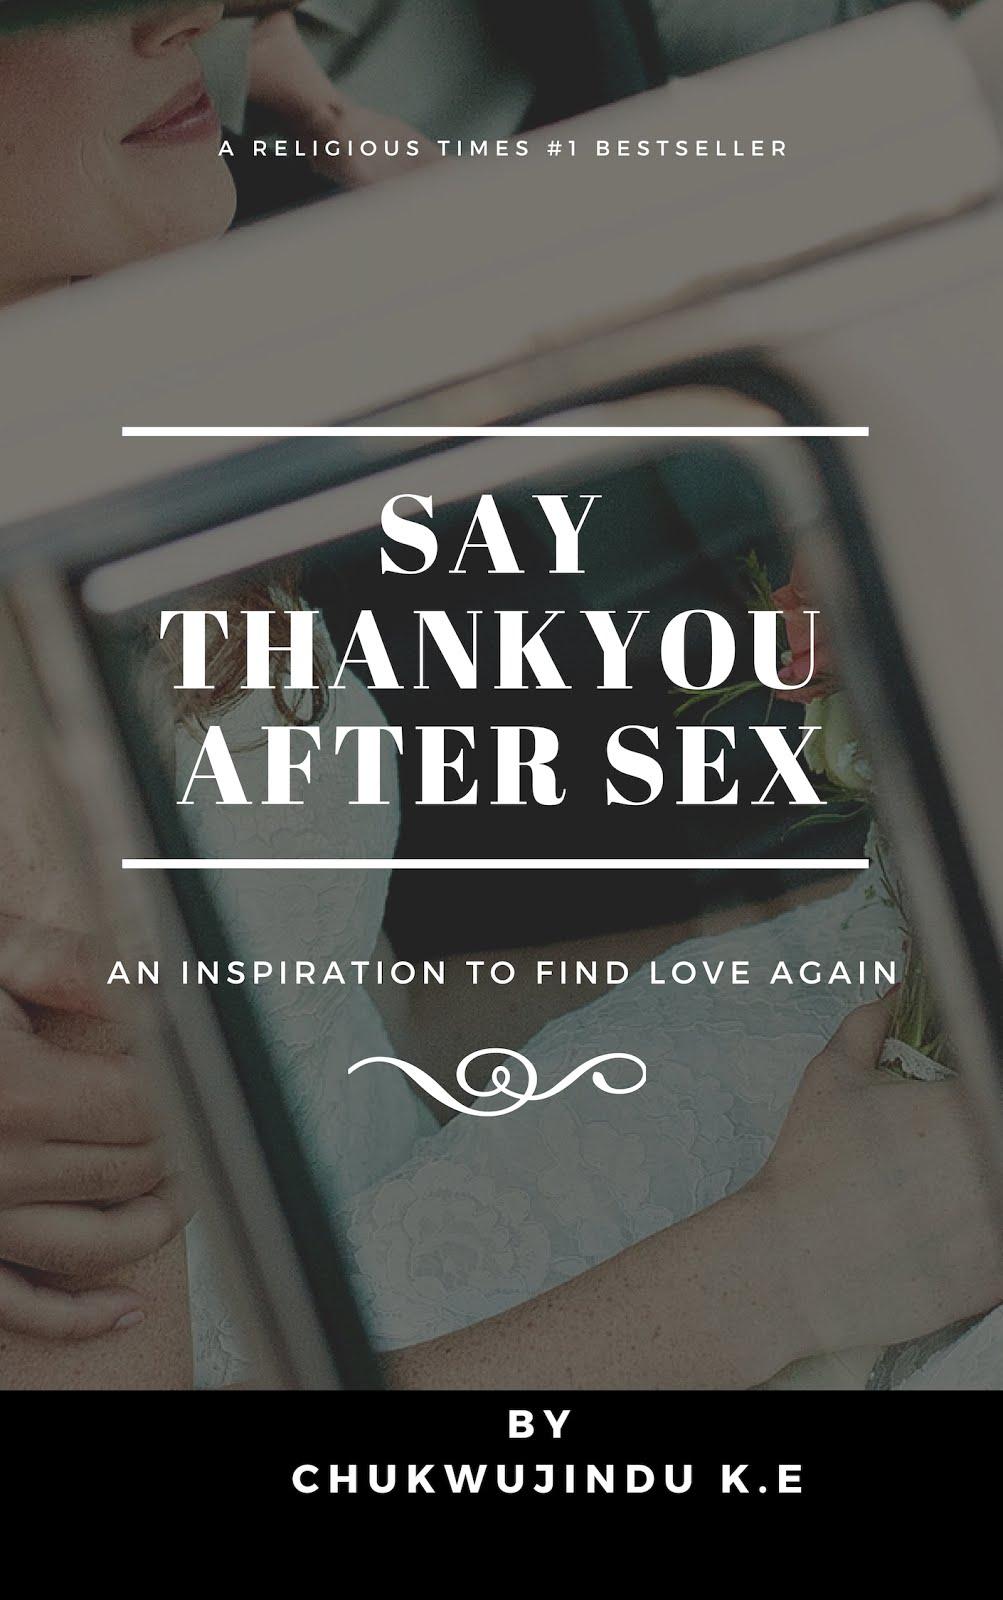 Say Thank You After Sex - By Chukwujindu K.E